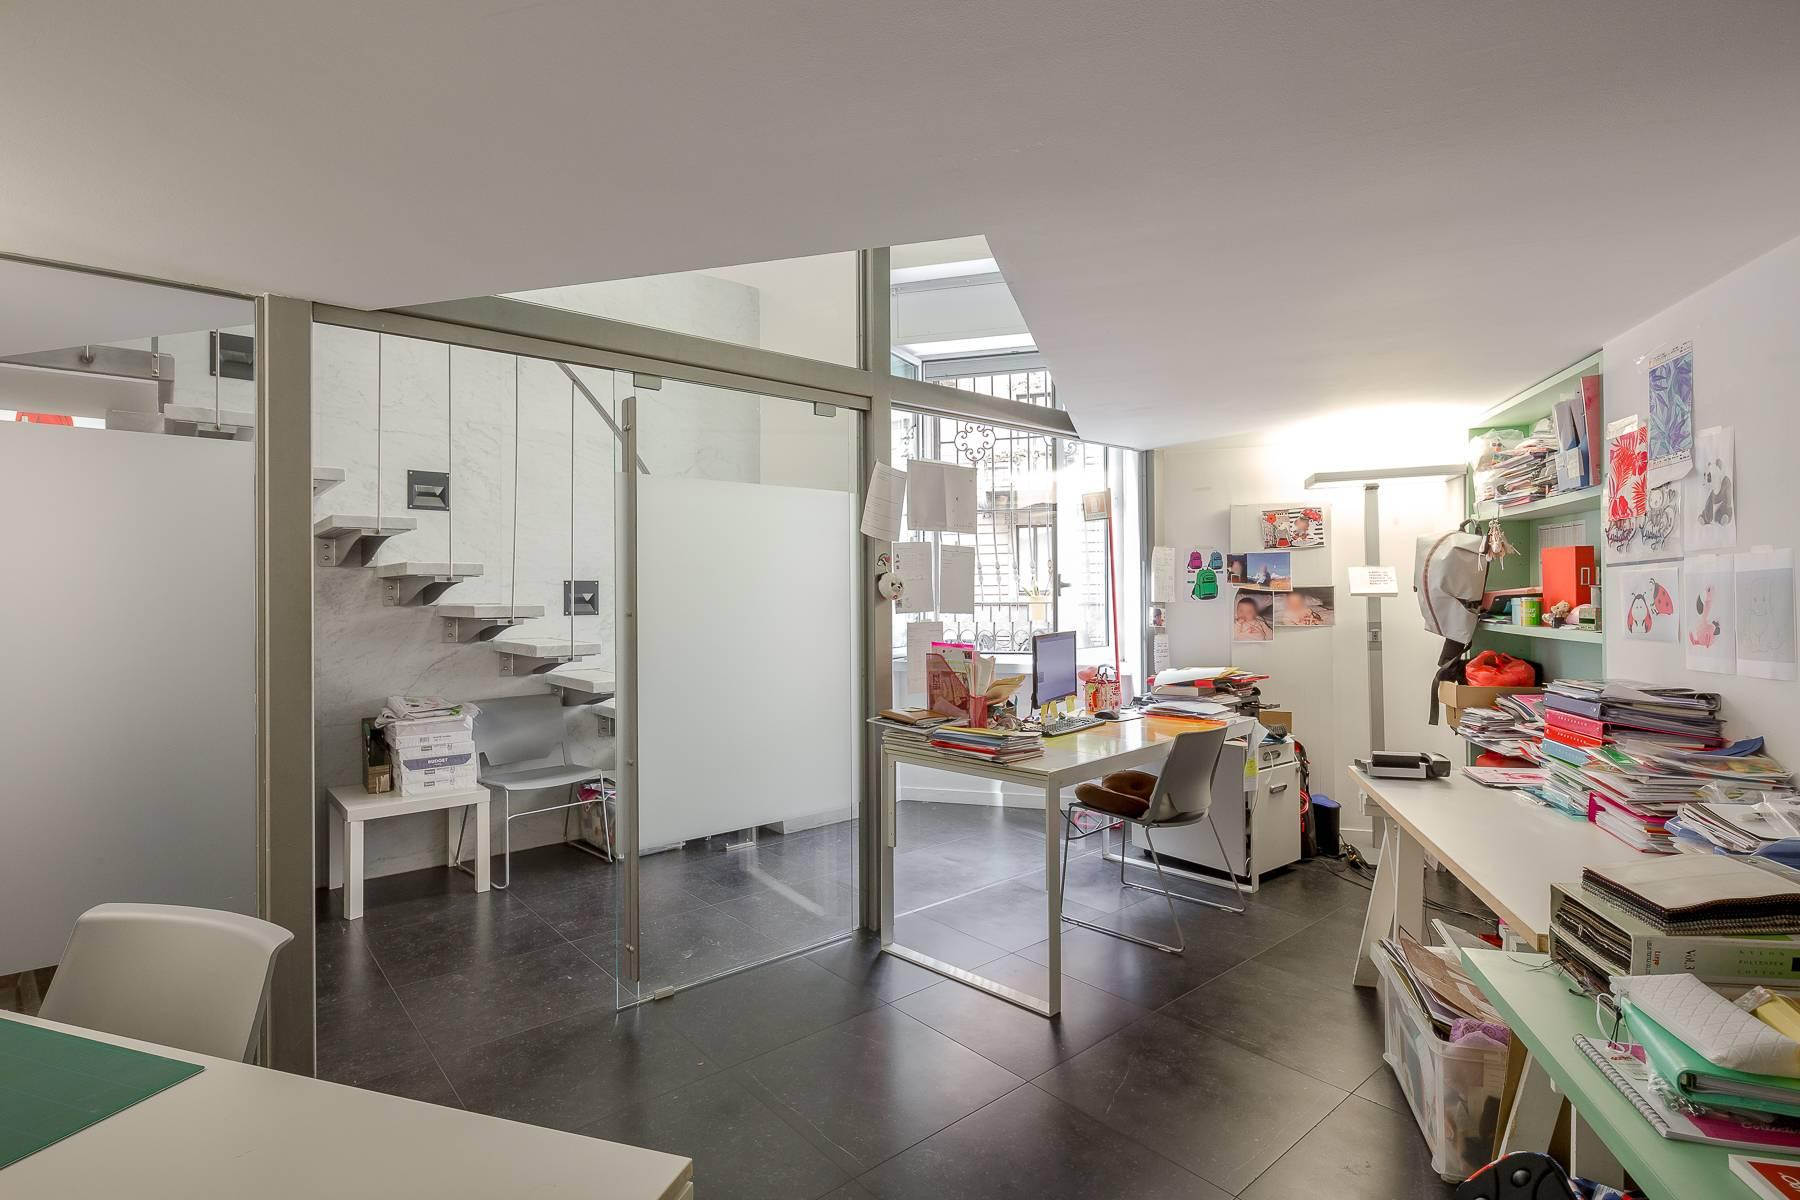 Opne-Space Büro / Wohnimmobilie auf der Piazza Giovine Italia / Via Aurelio Saffi - 20